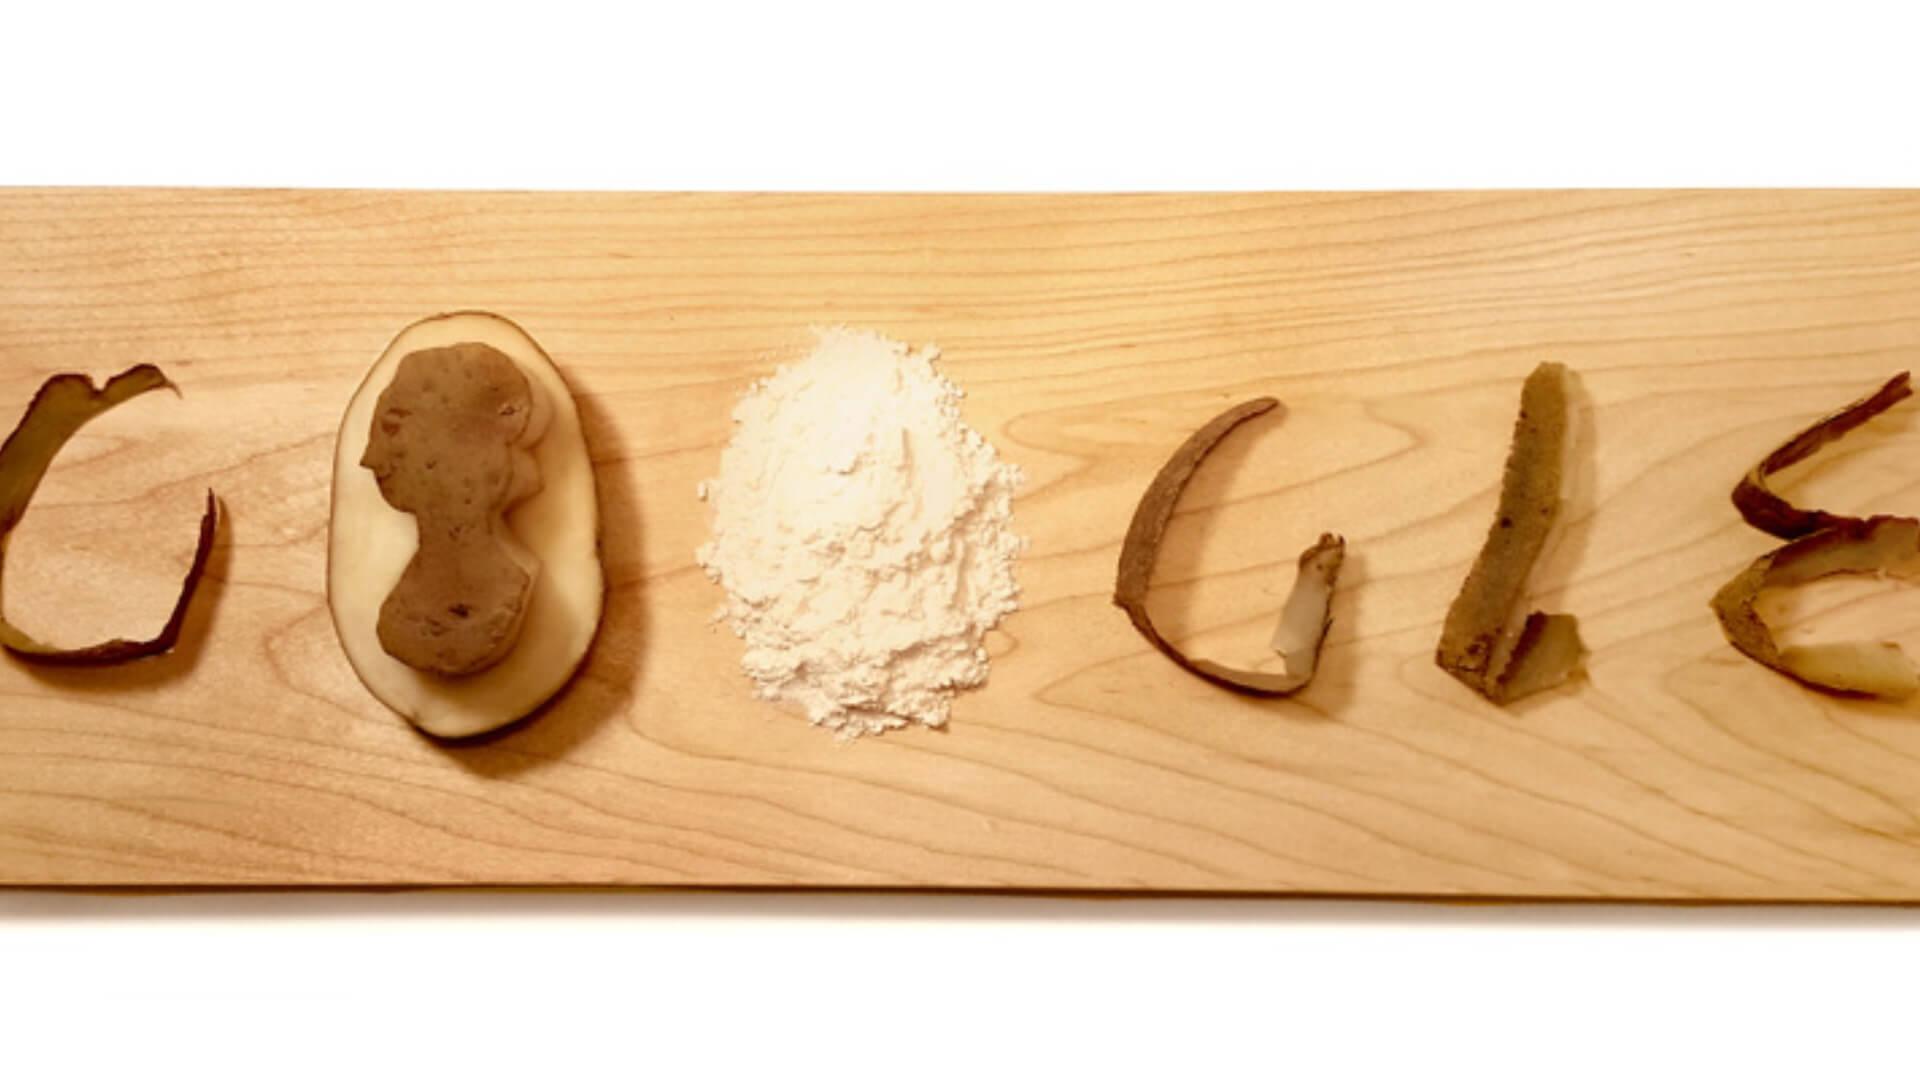 Eva Ekeblad Google doodle celebrates scientist who made flour & alcohol from potatoes